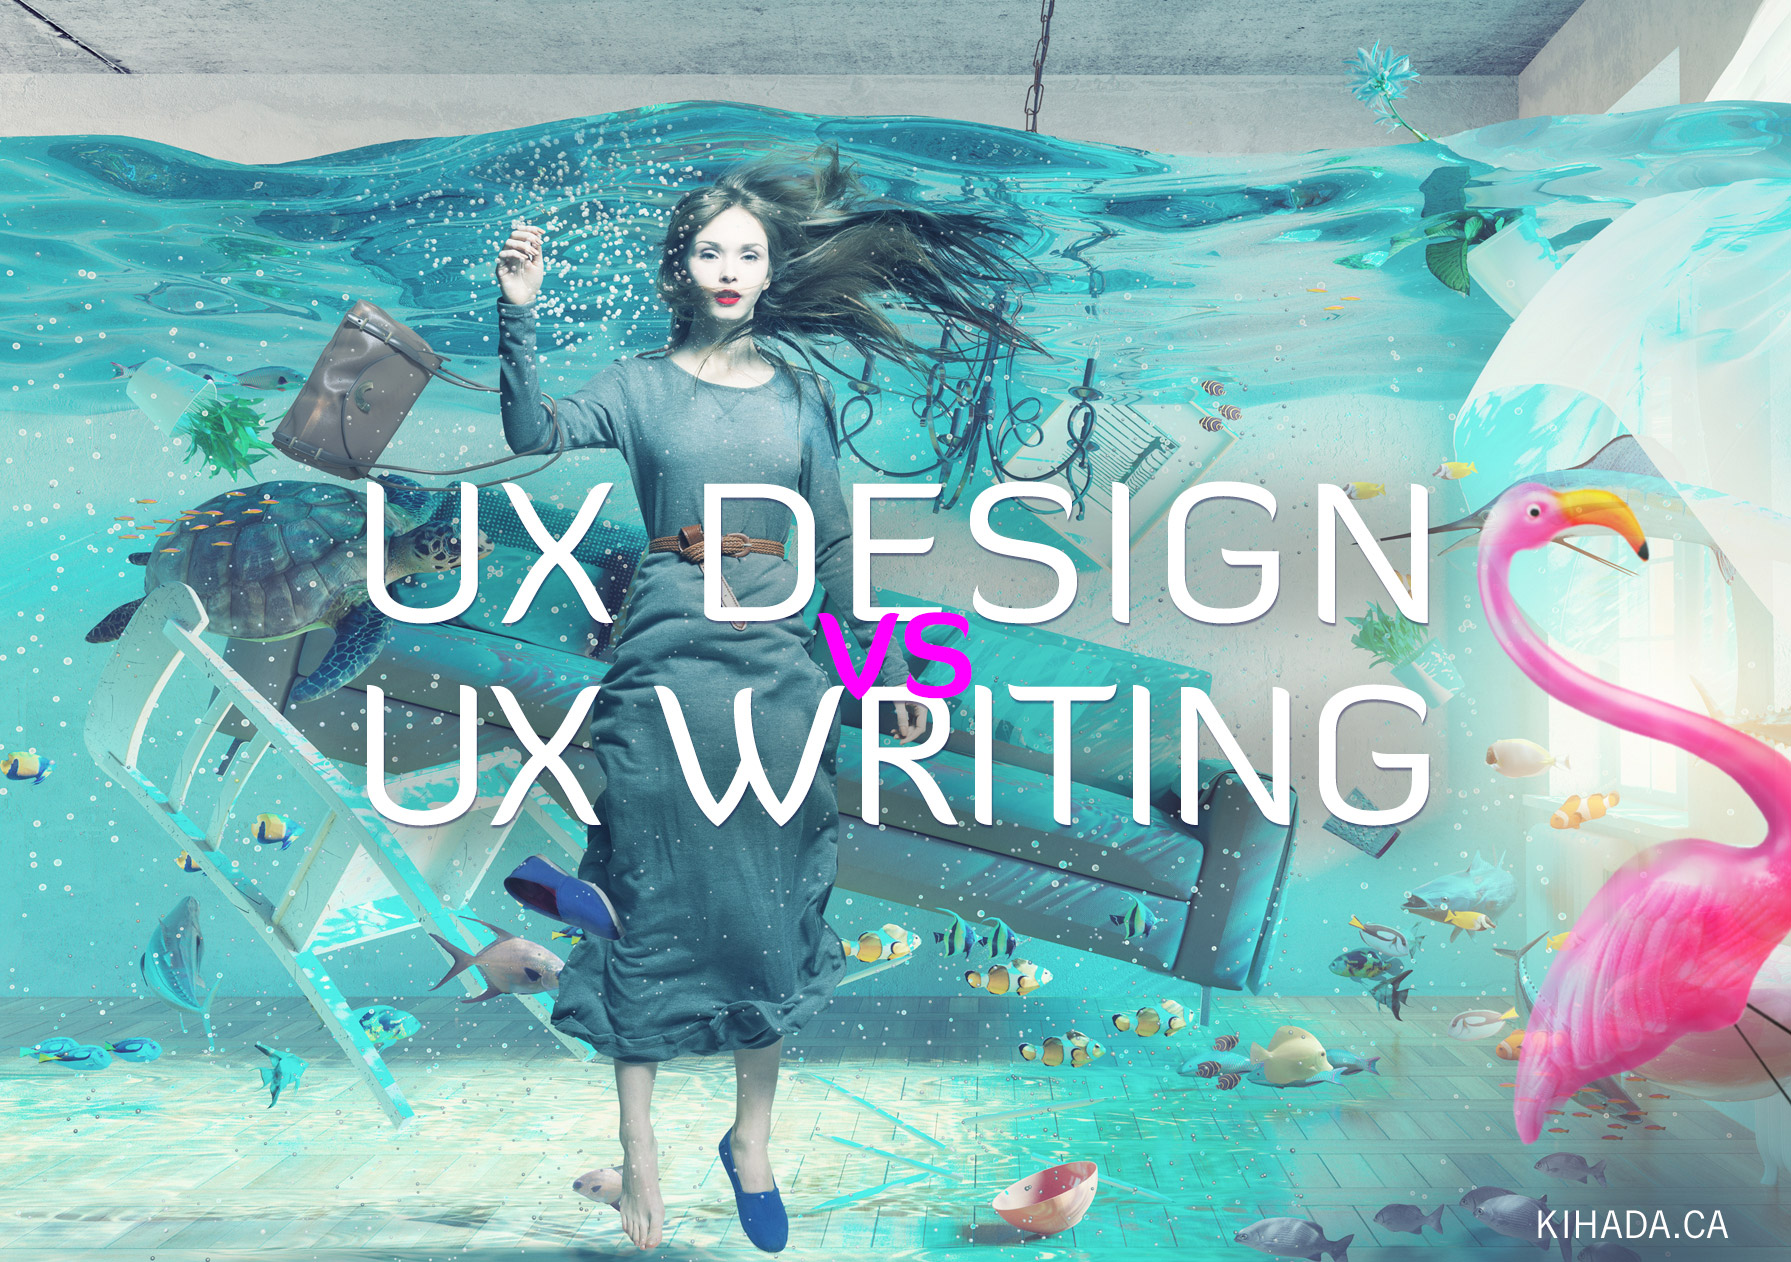 Creative Agency Vancouver